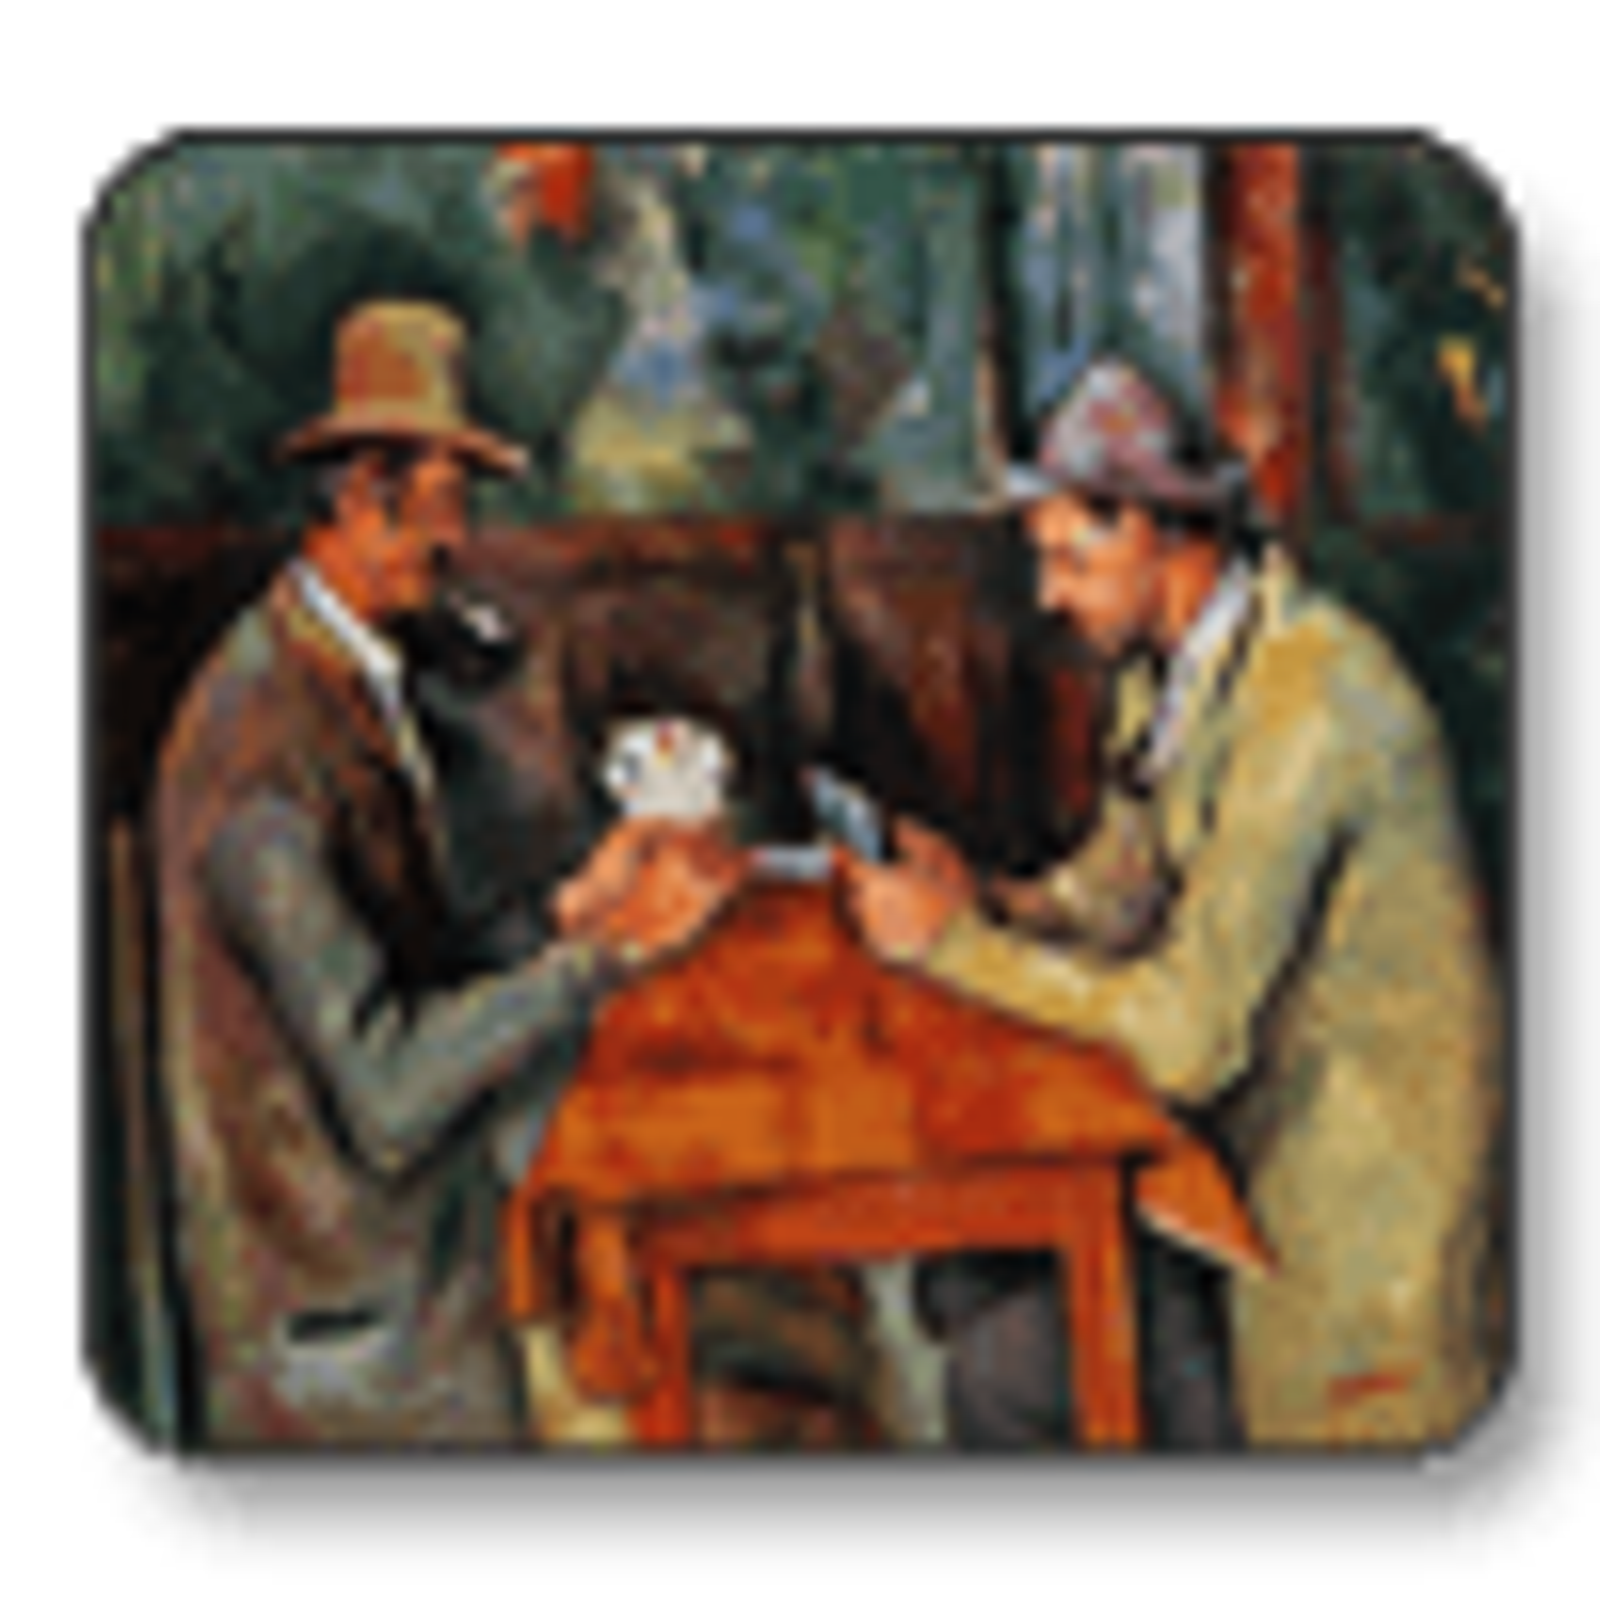 Paul Cezanne Painting Screensaver 1.1.0